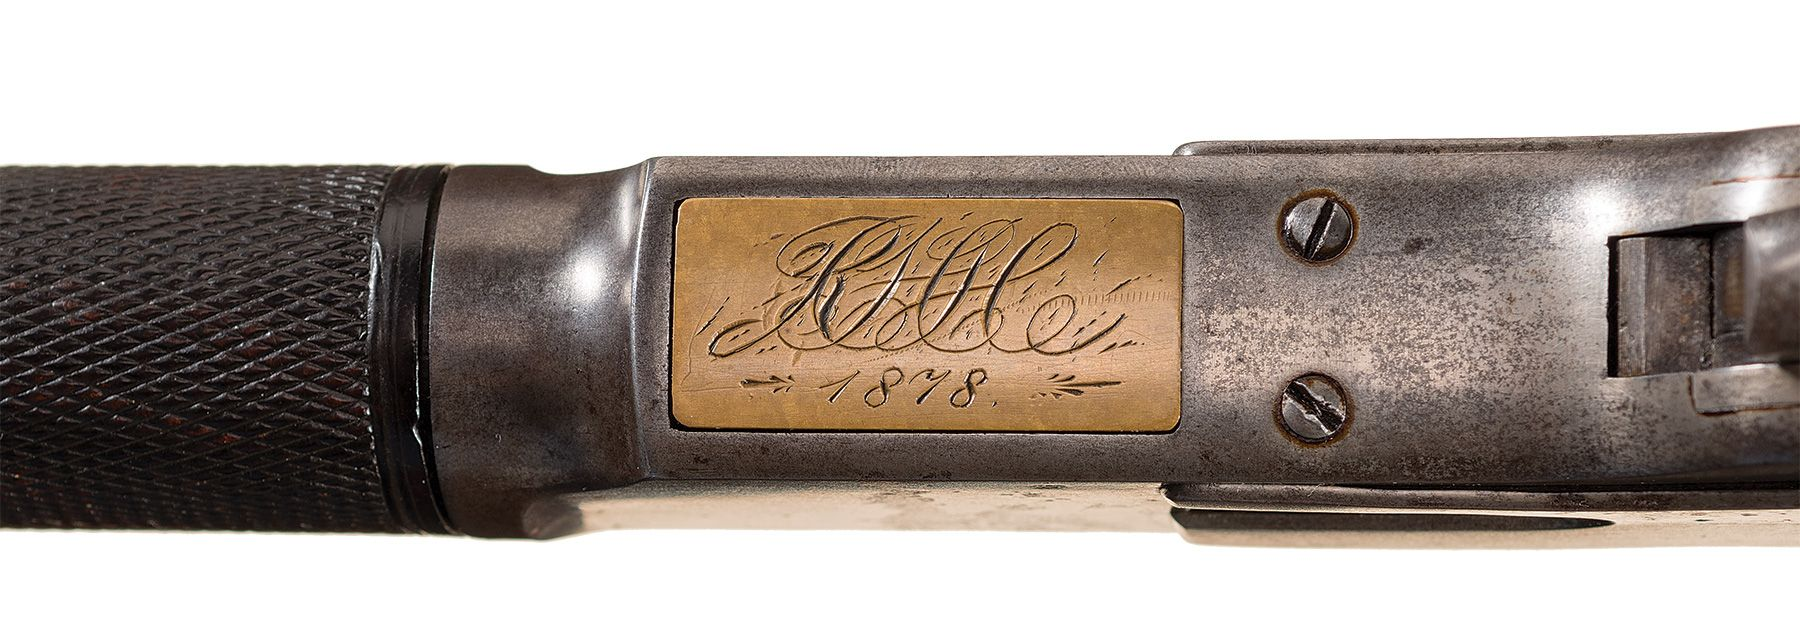 "Robert Hopewell Hepburn Winchester ""One of One Hundred"" M1873 rifle"